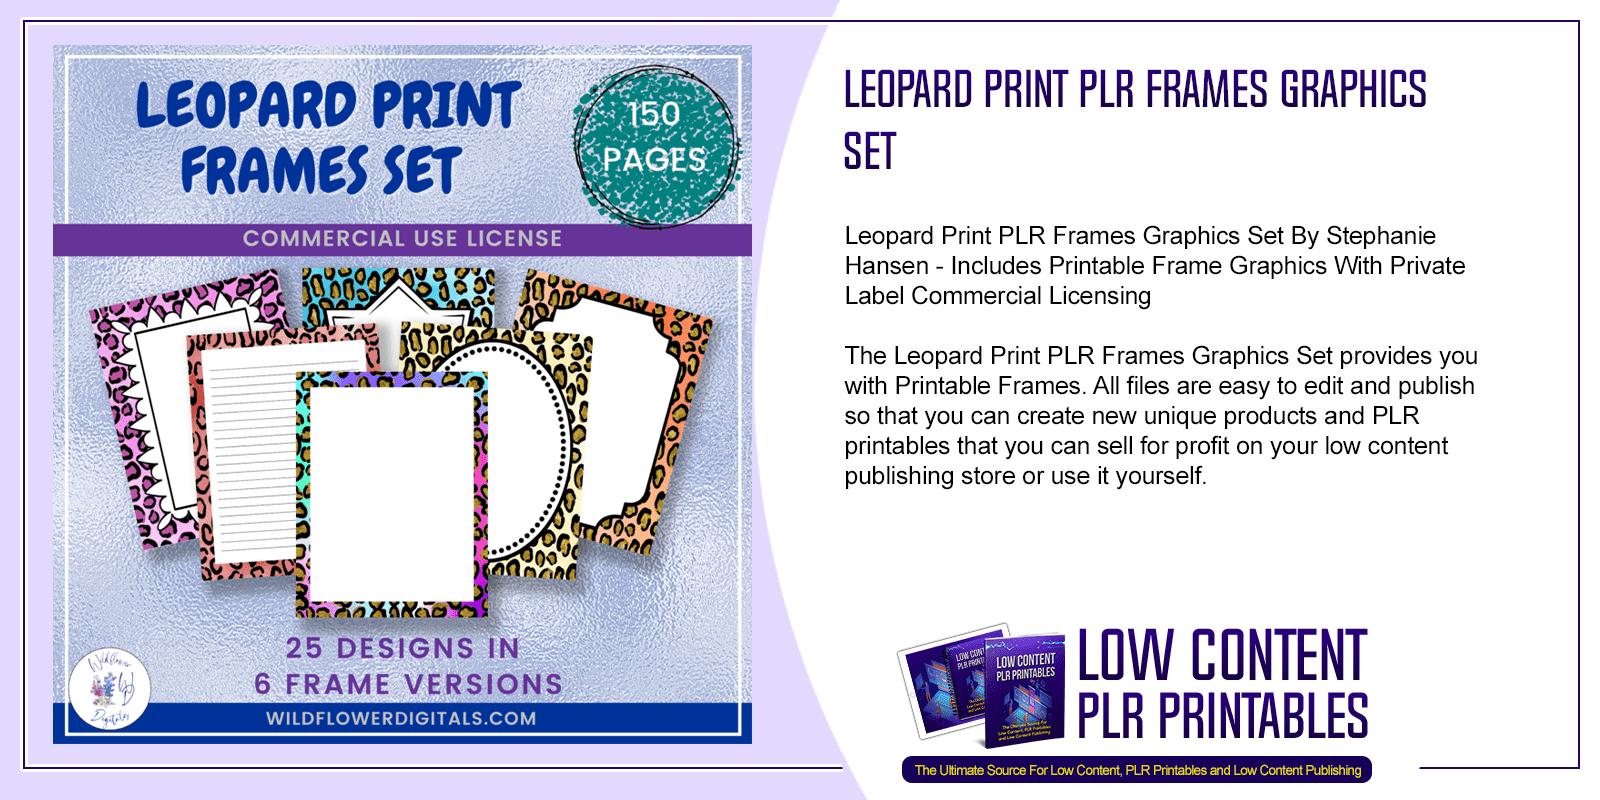 Leopard Print PLR Frames Graphics Set